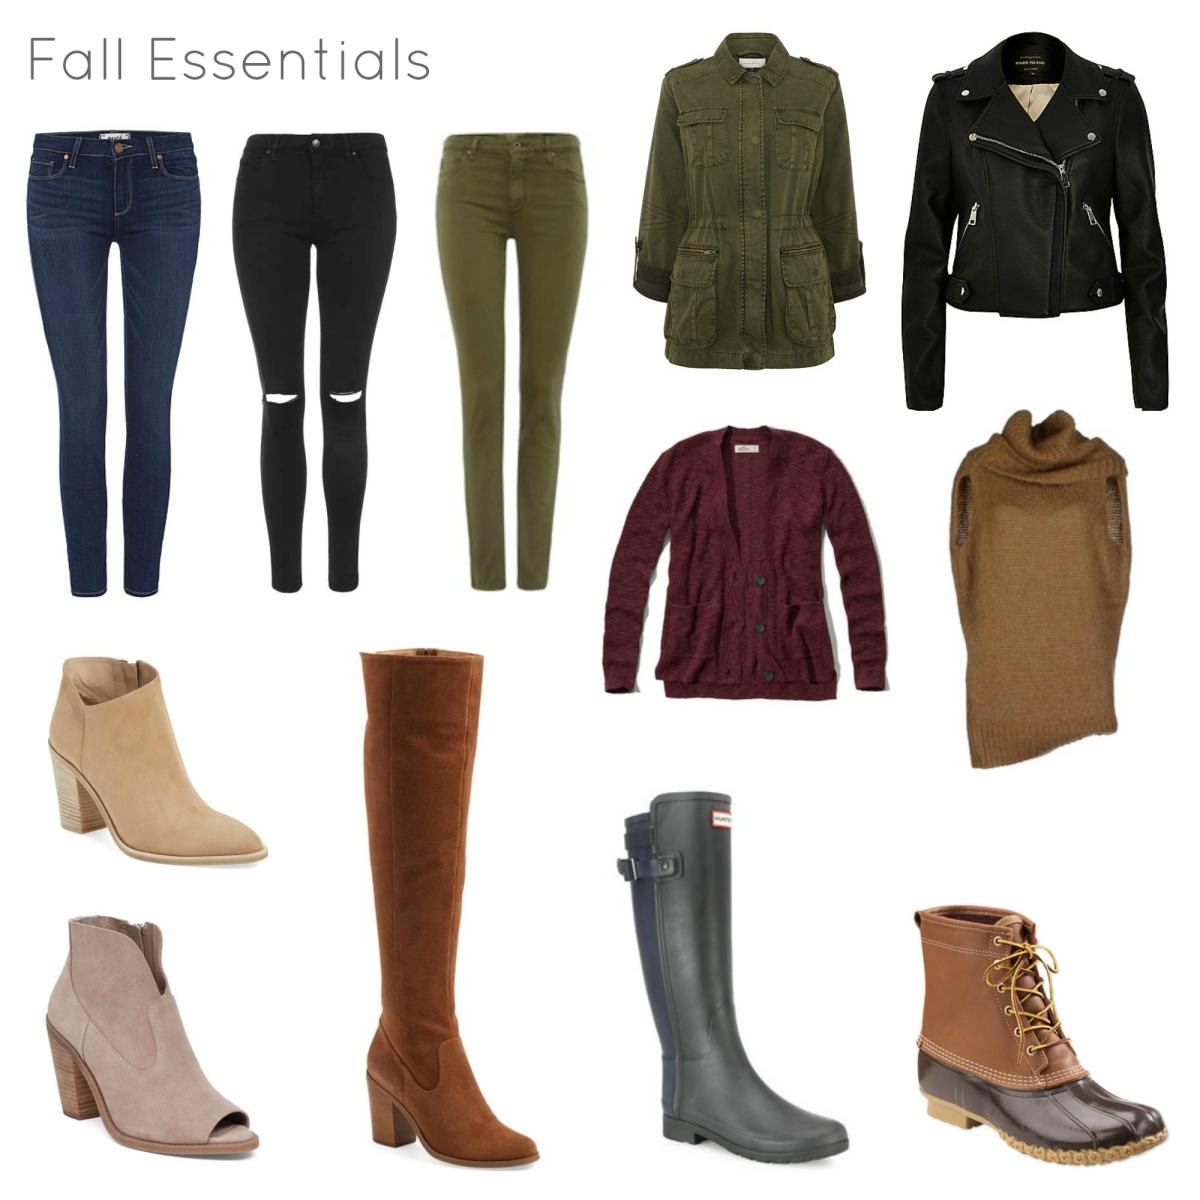 Fall 2016 Wardrobe Essentials  www.pearlsandsportsbras.com 